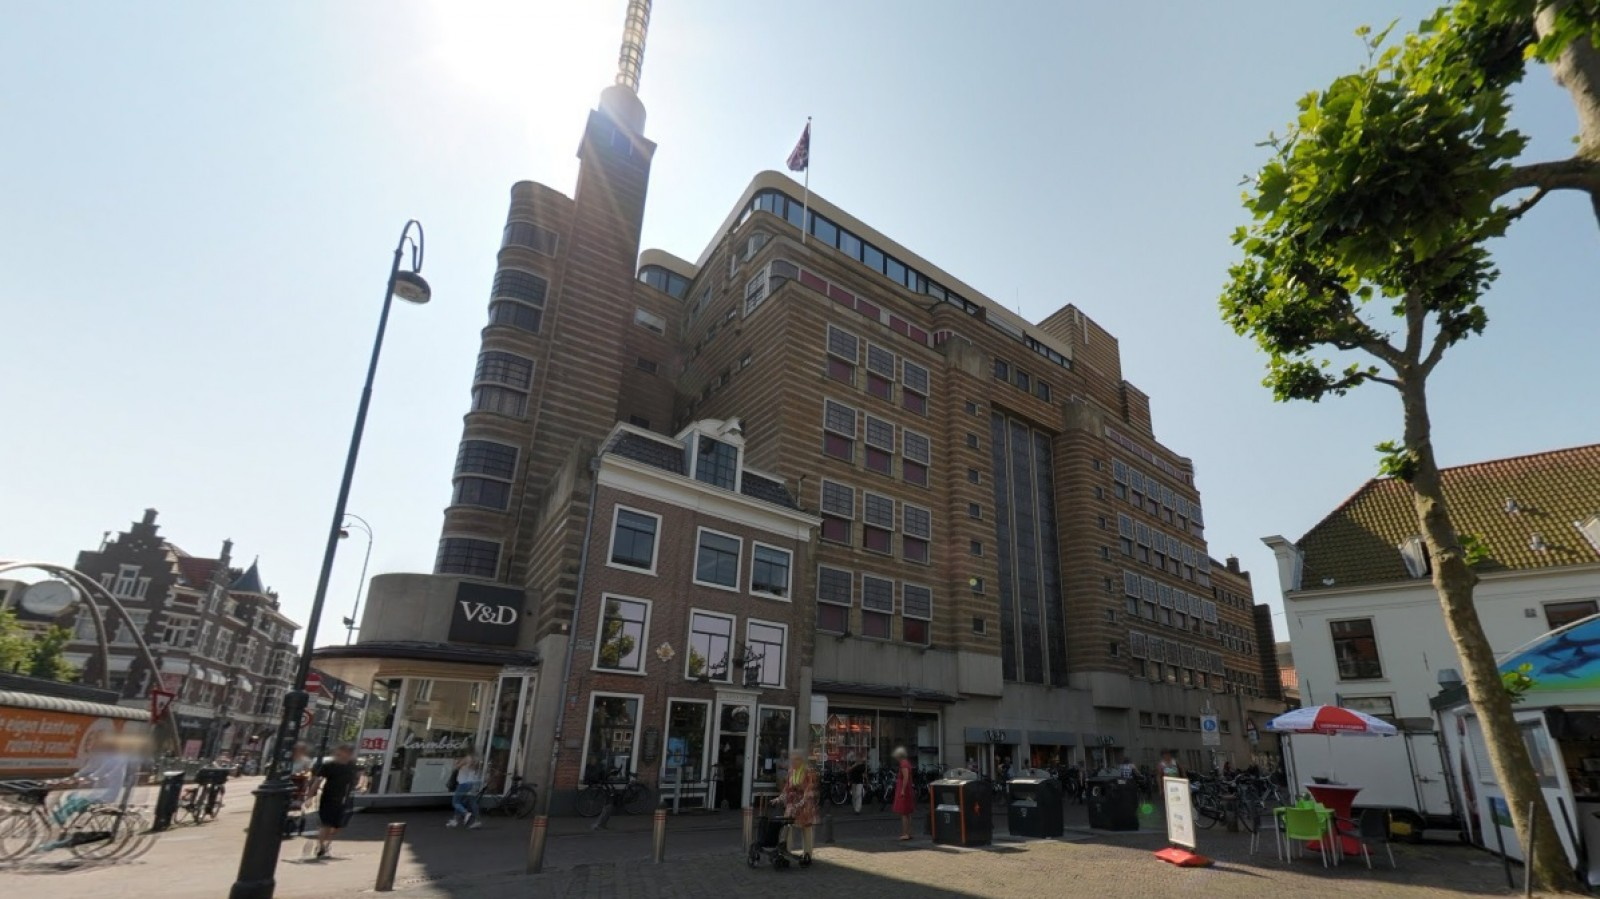 Google Maps - V&D Haarlem Centrum